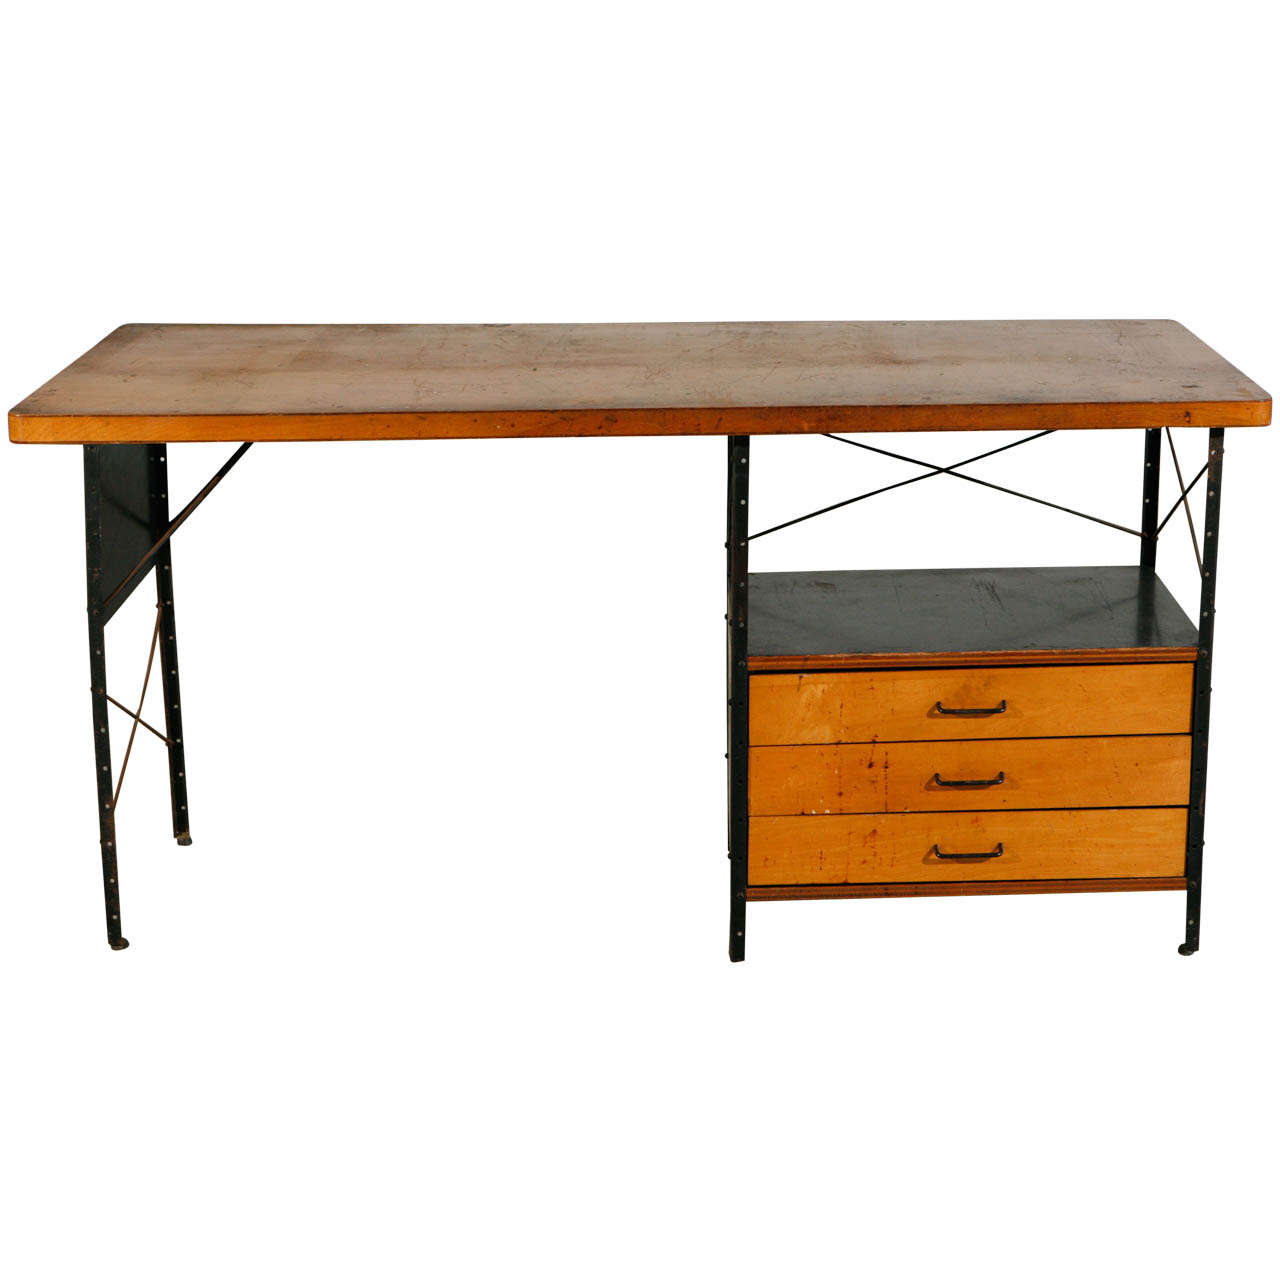 Charles eames desk by herman miller at 1stdibs - Eames table herman miller ...